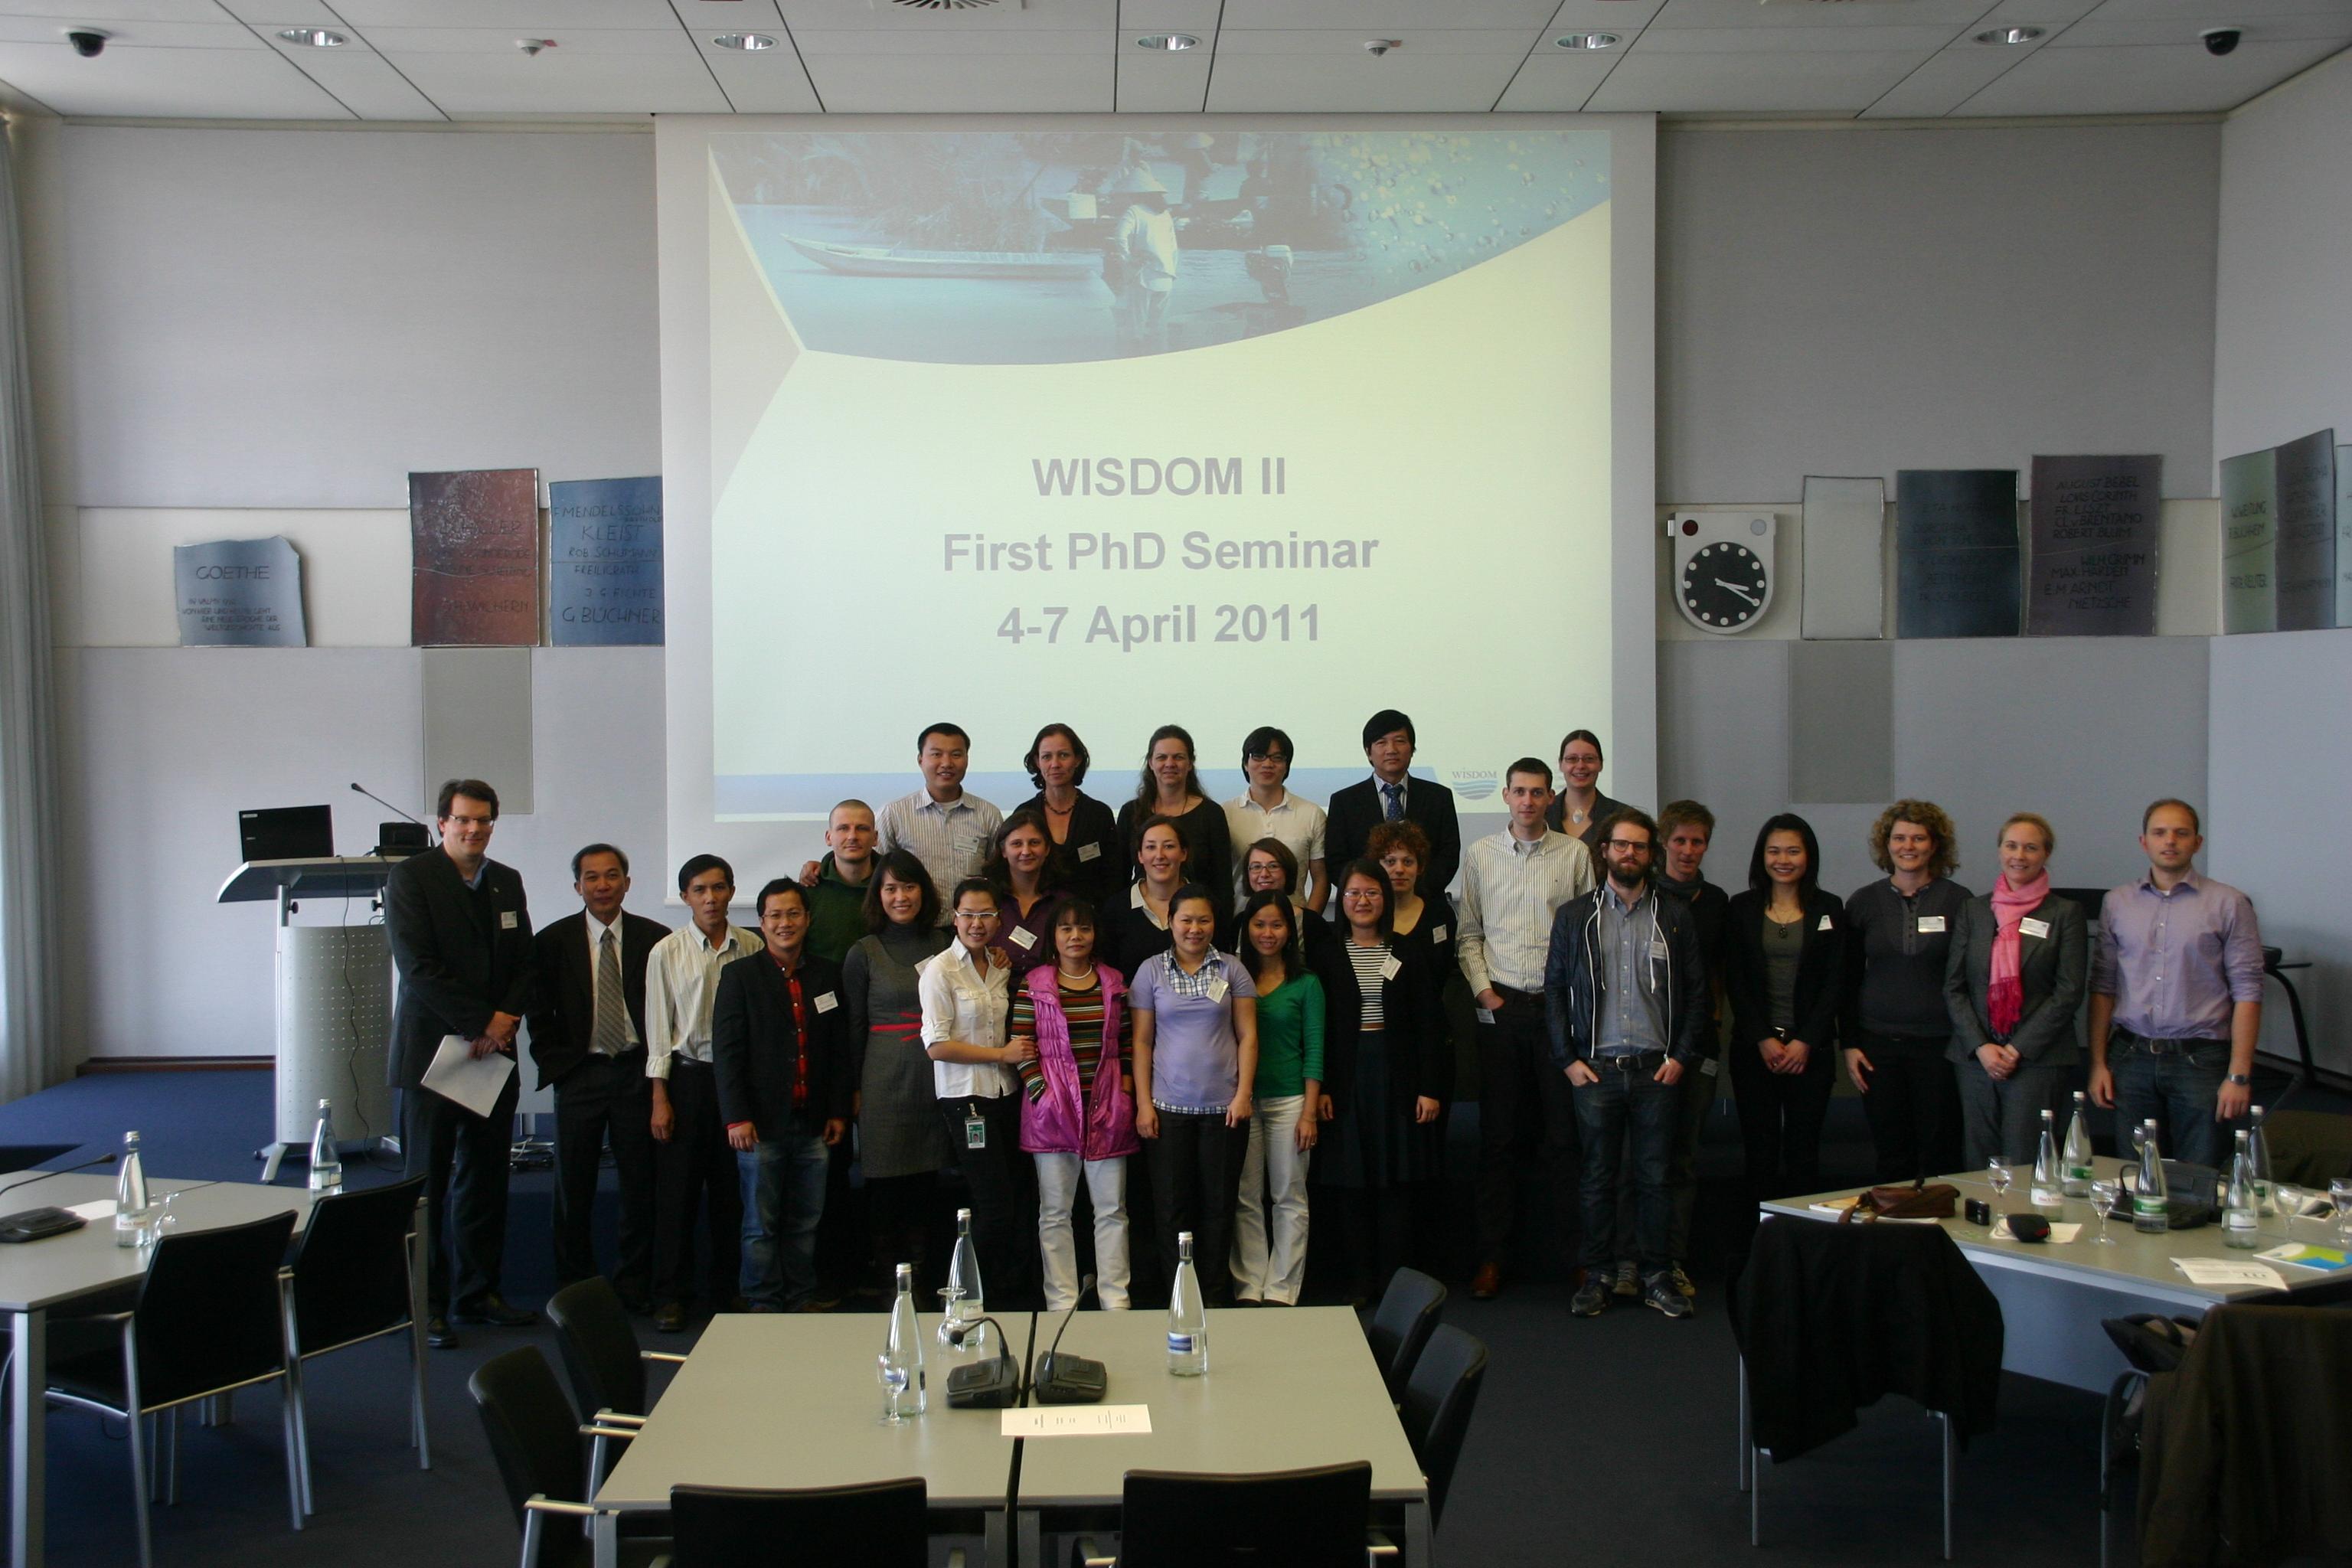 buchner seminare